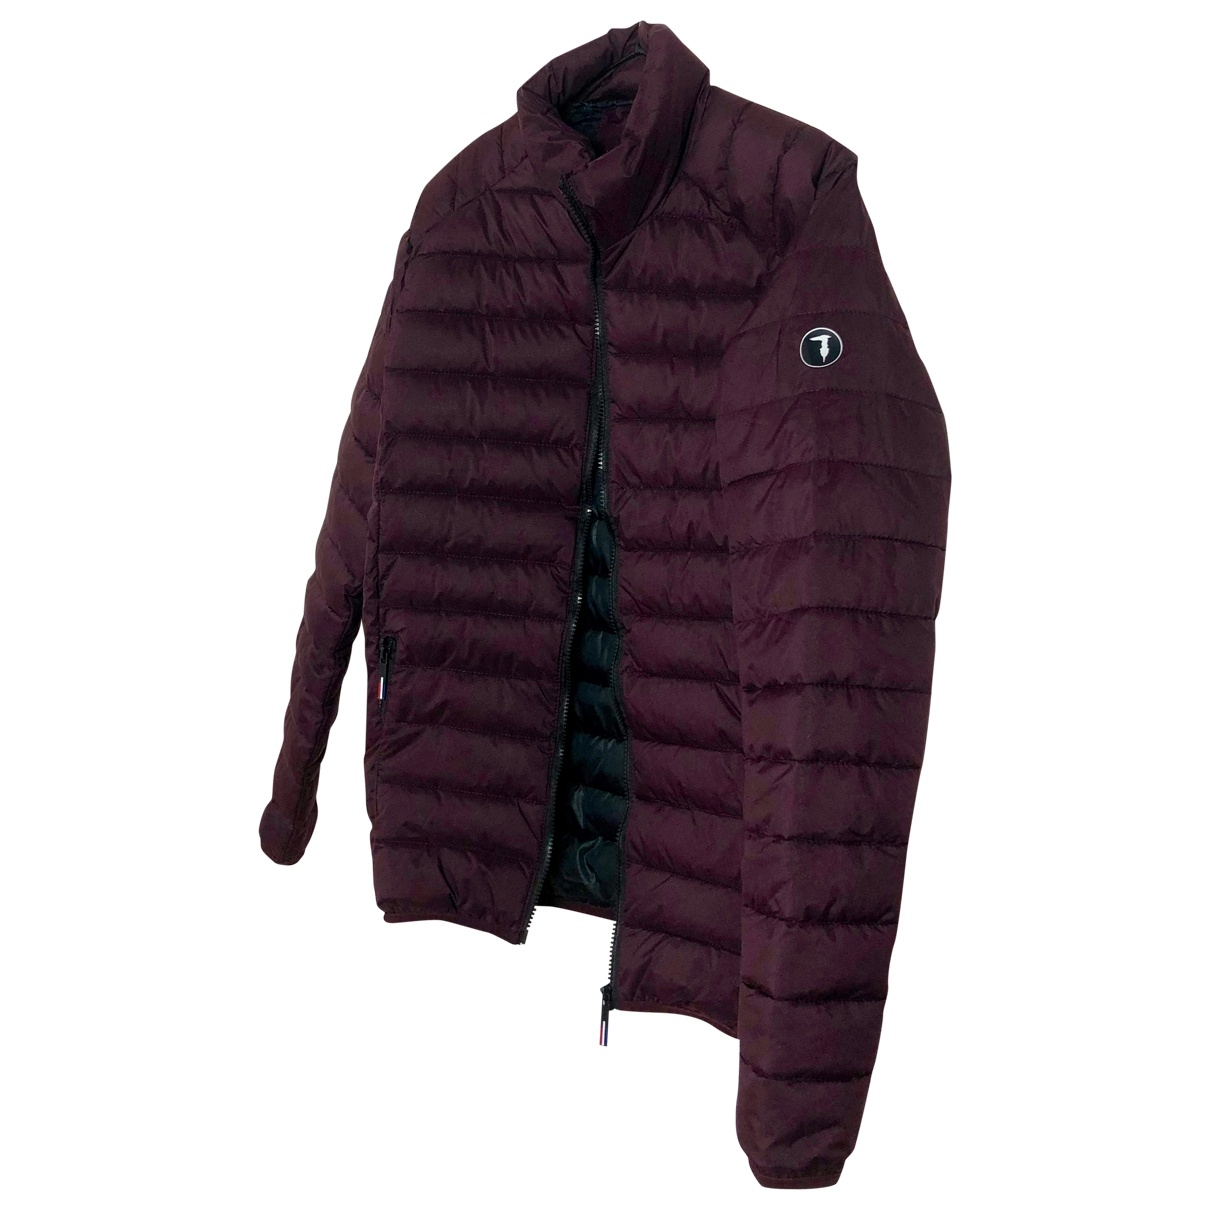 Trussardi \N Burgundy jacket  for Men L International